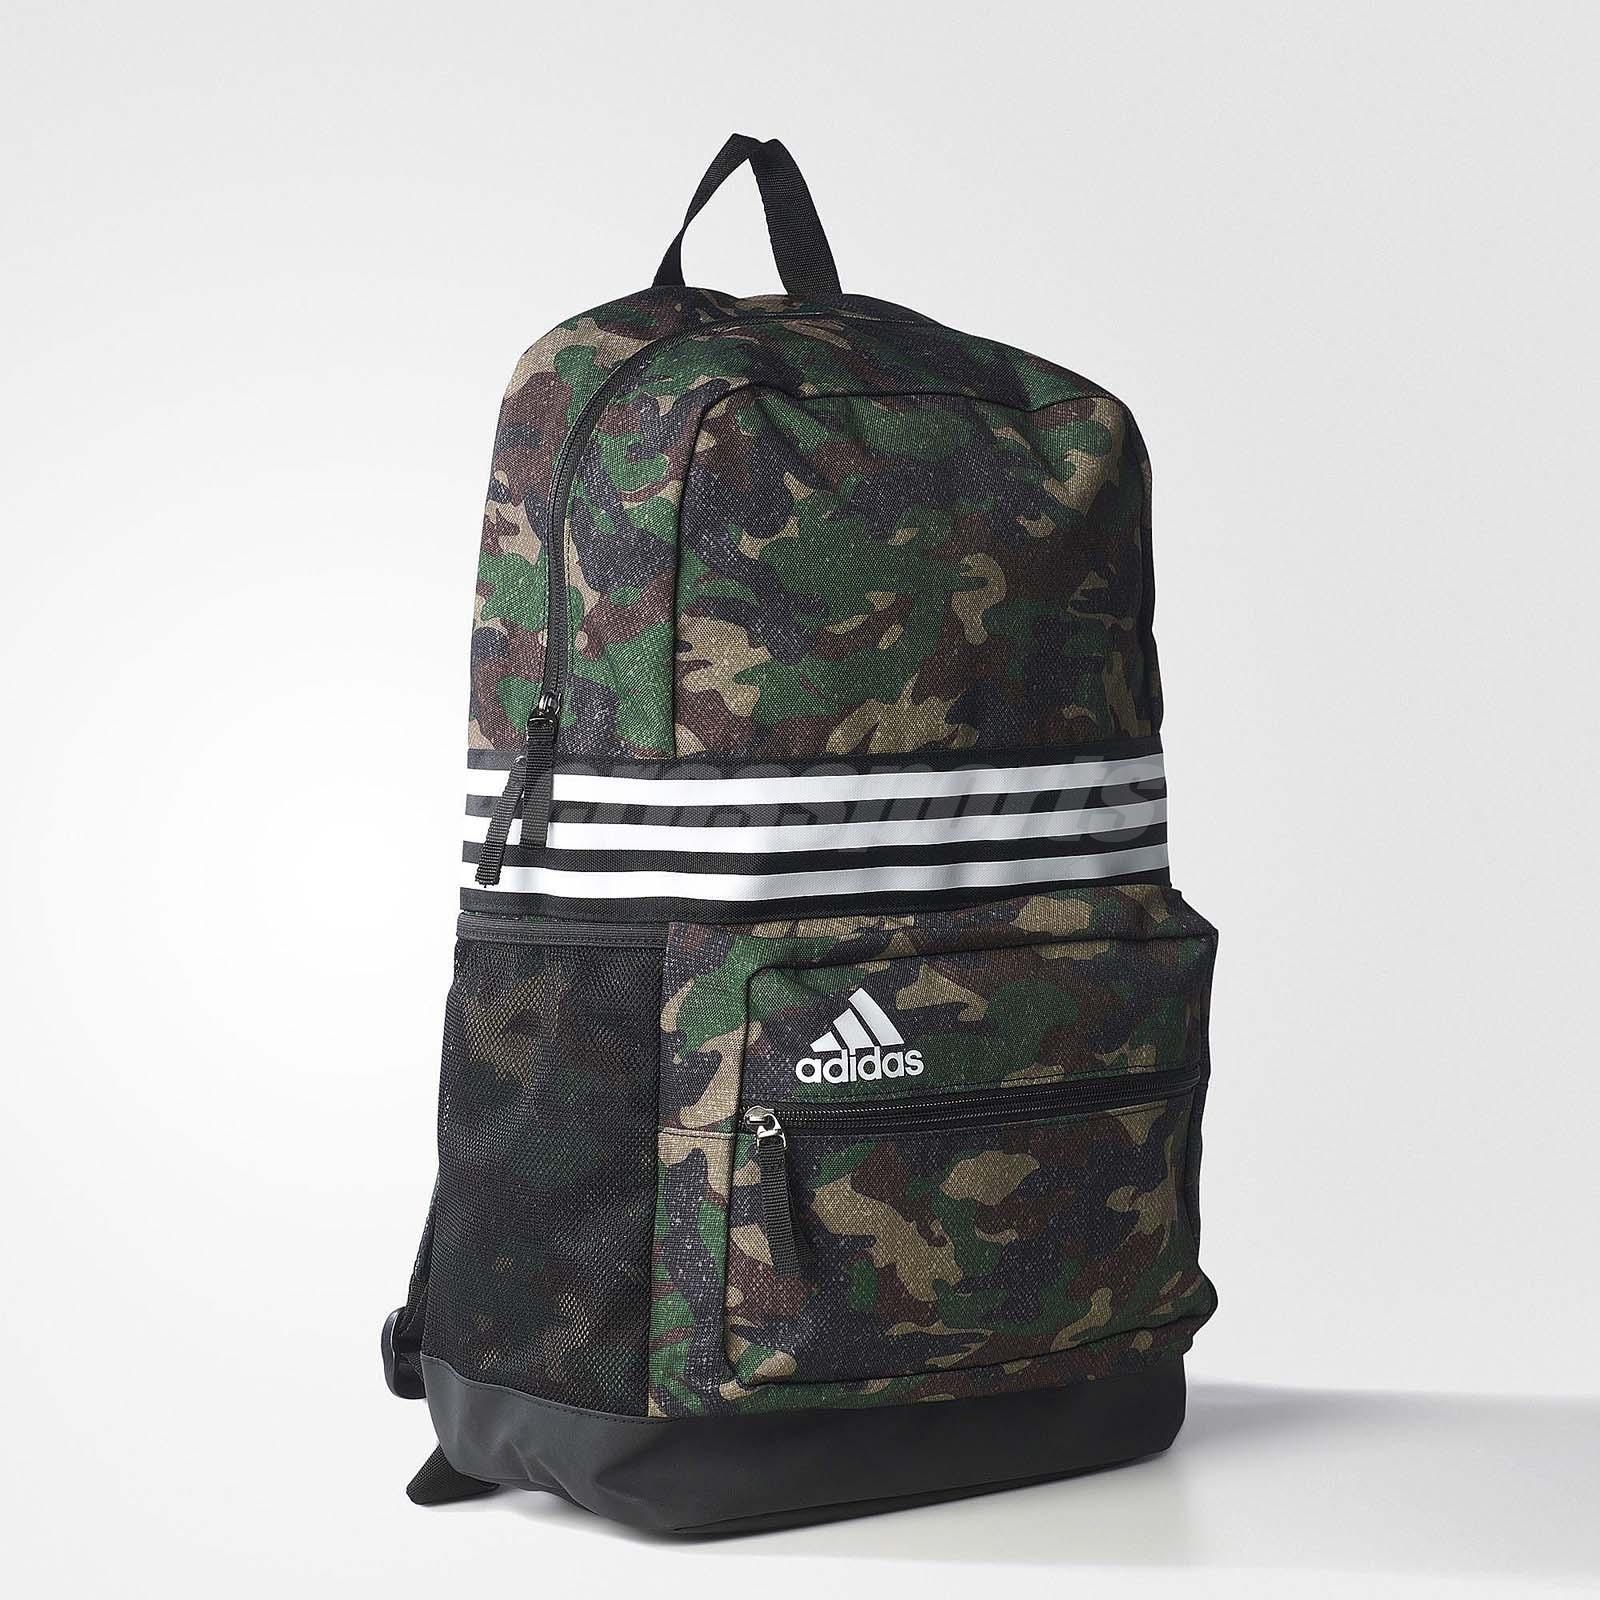 adidas backpack camo